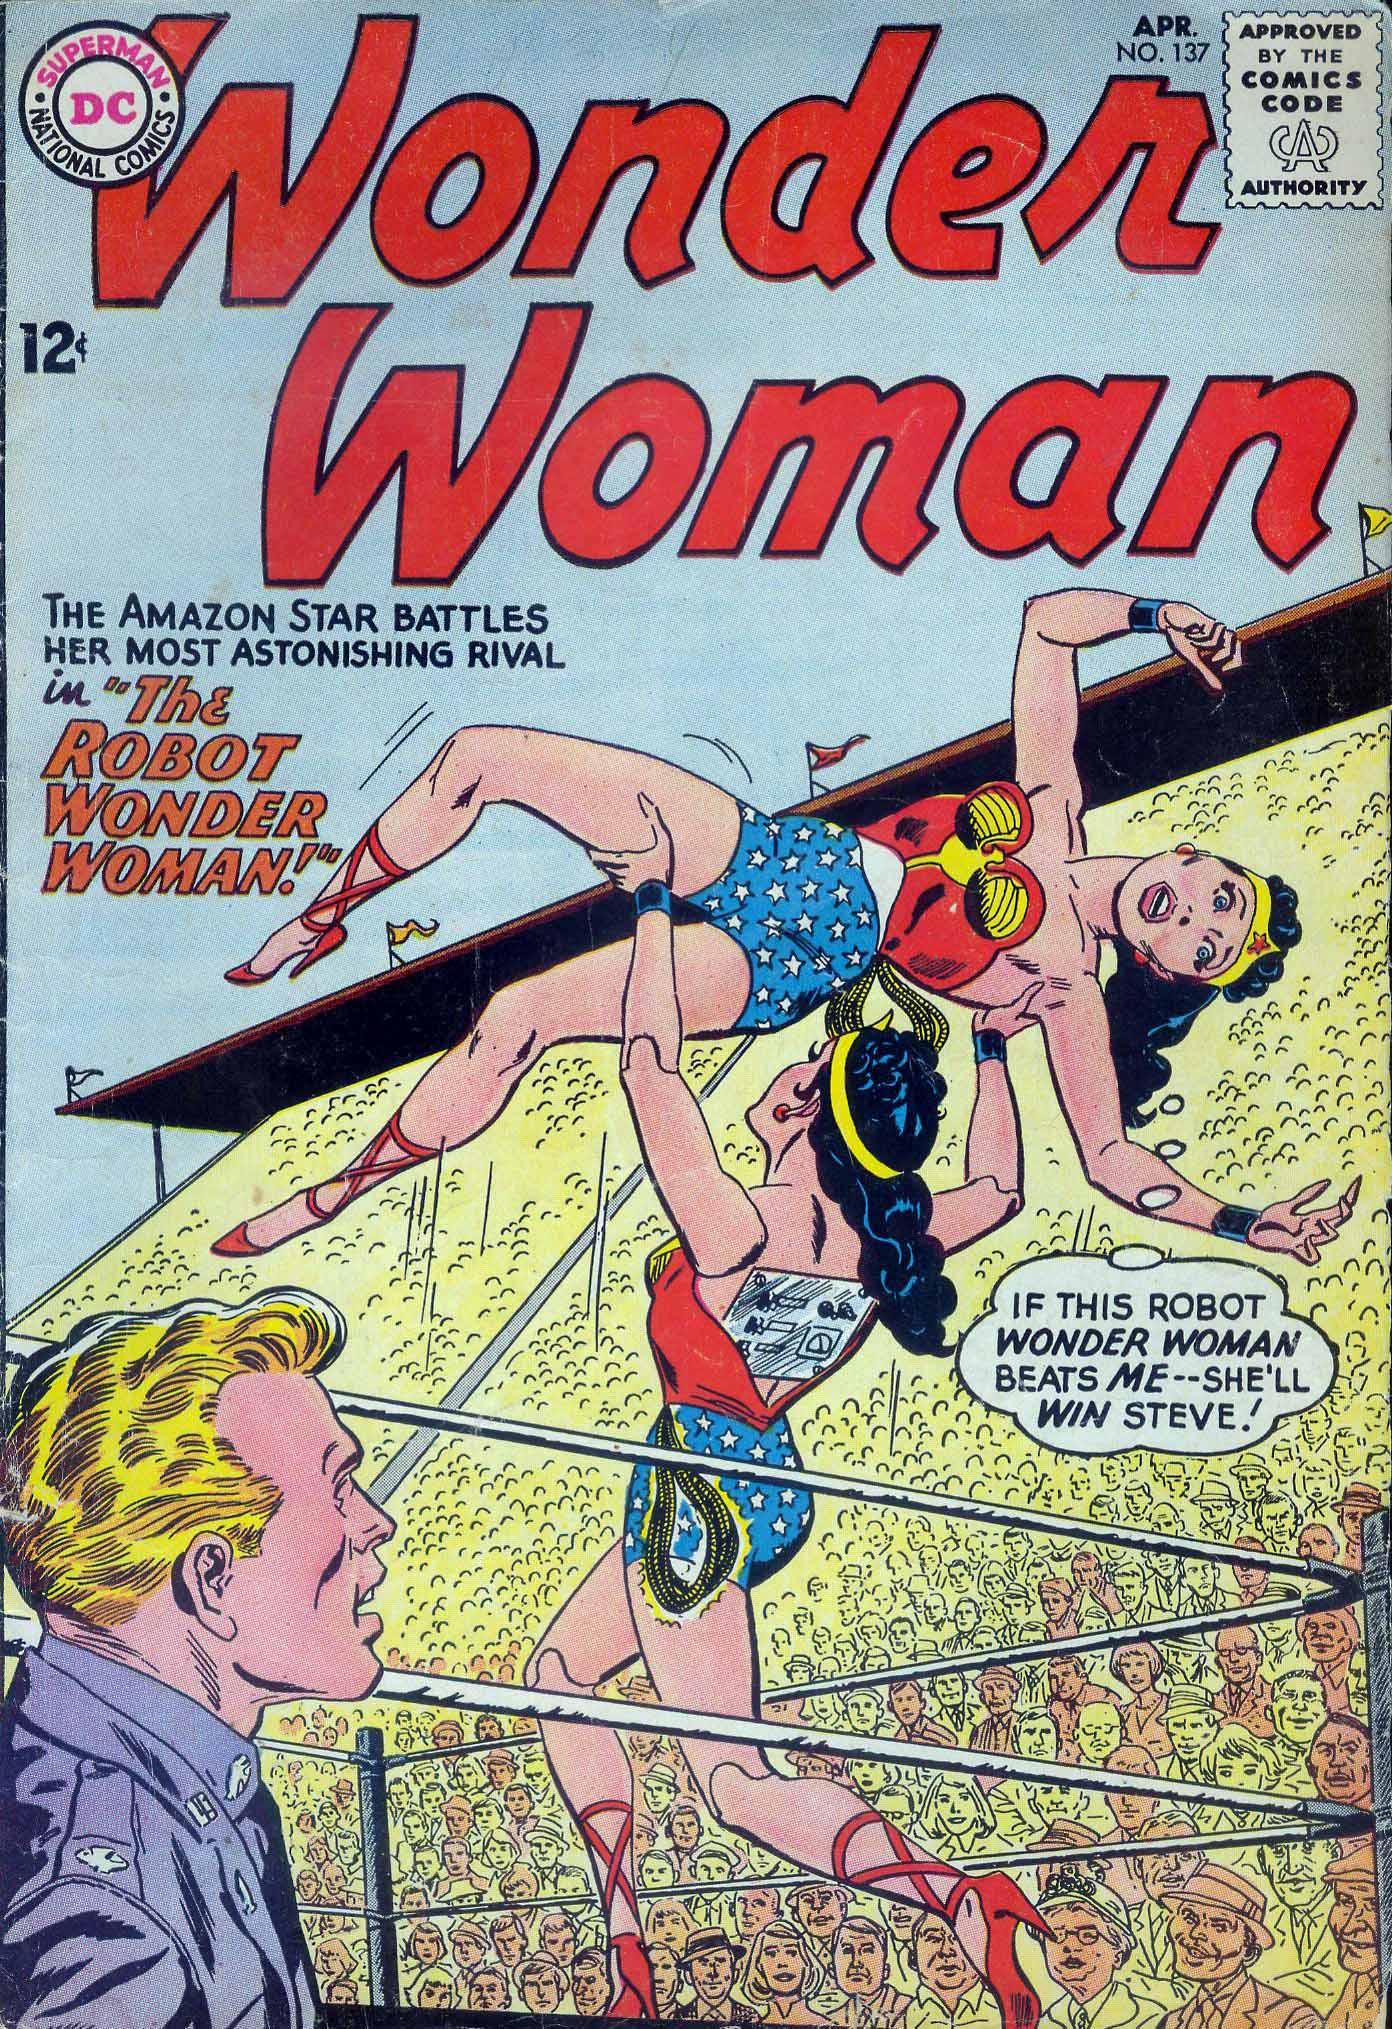 Read online Wonder Woman (1942) comic -  Issue #137 - 1